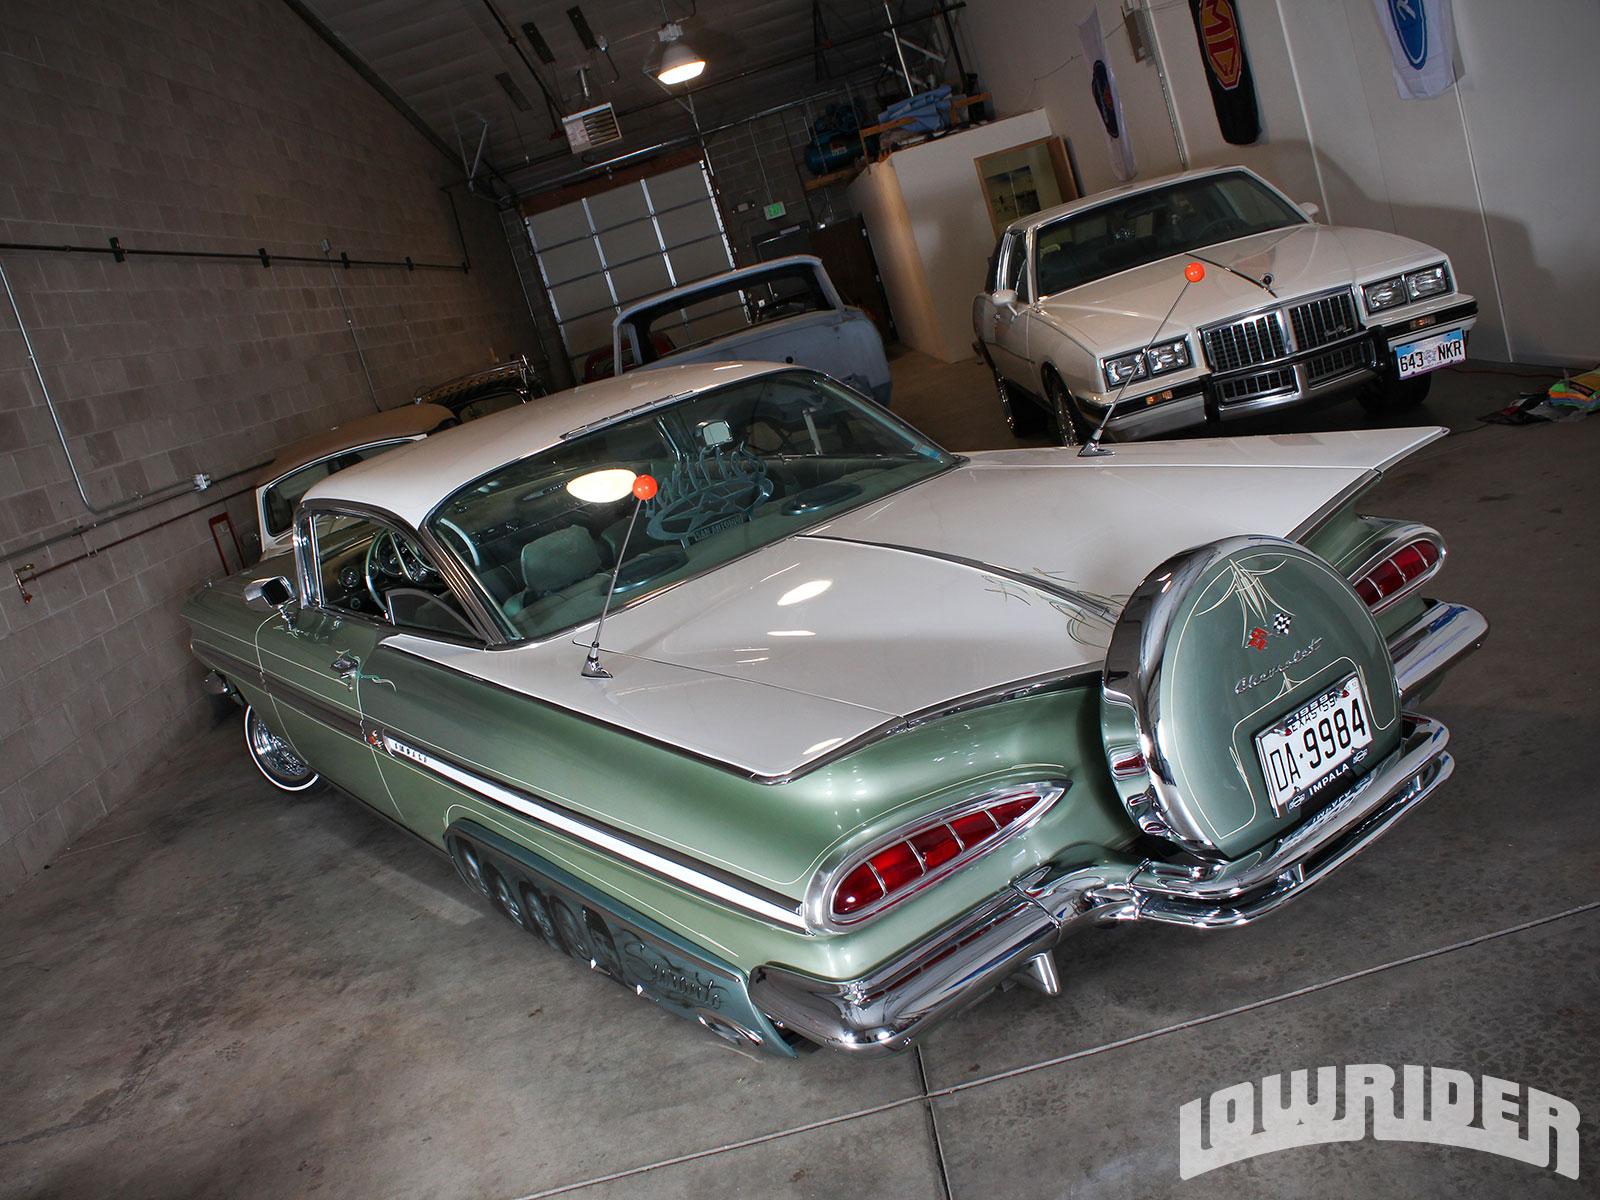 1959 Chevrolet Impala Lowrider Magazine Chevy Rear Wiring Harness 13 25